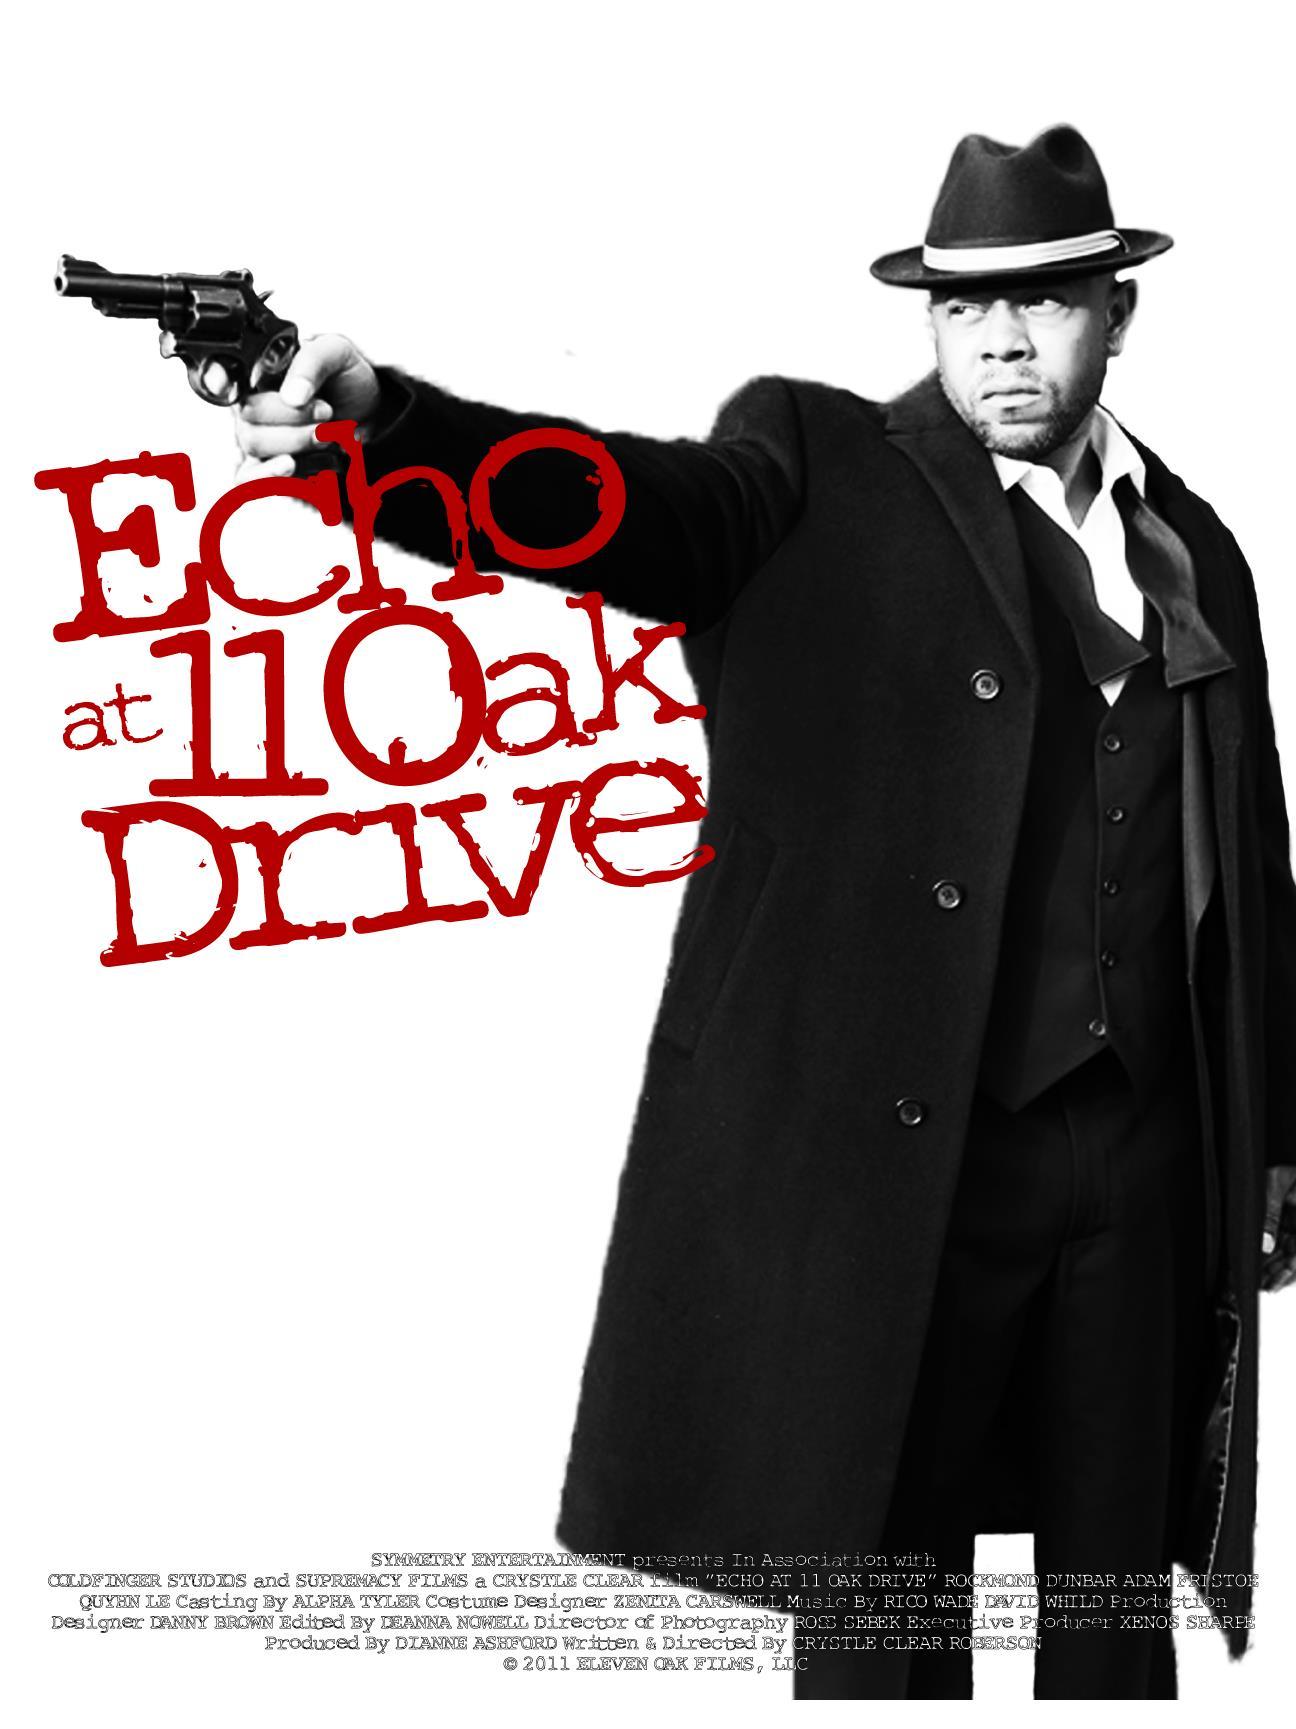 Echo at 11 Oak Drive (2012)